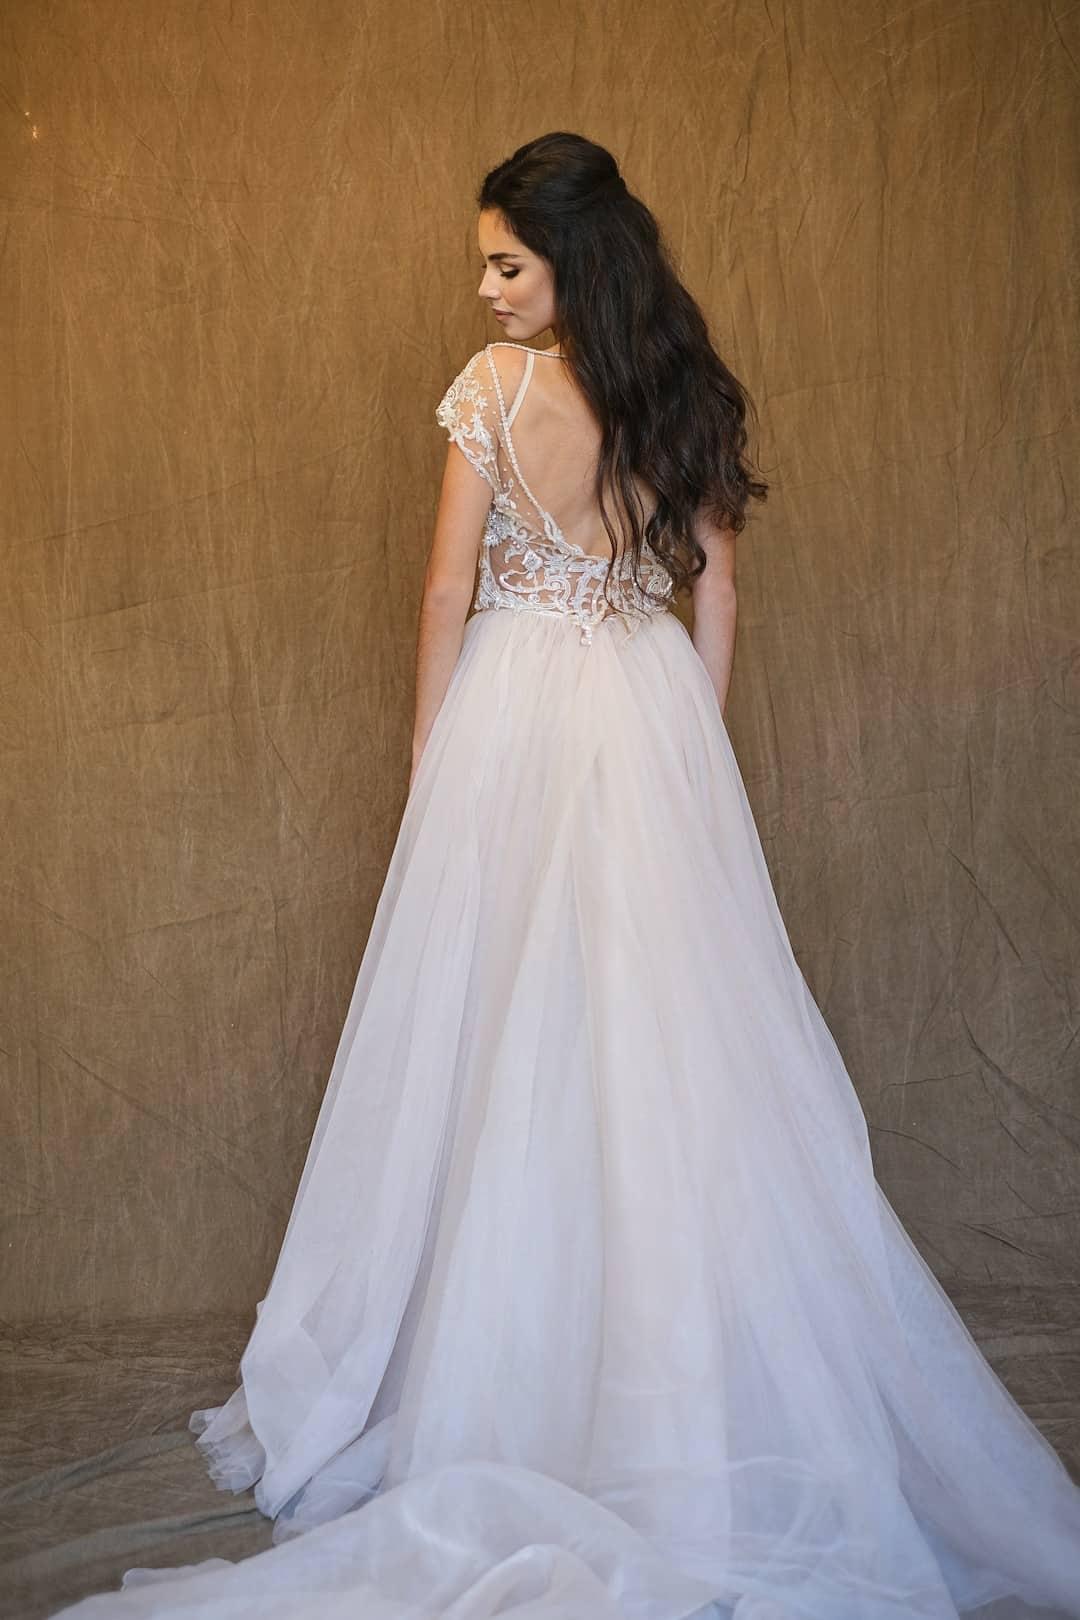 Wedding dresses on sale in Bratislava - Galia Lahav - Gala 607 - back